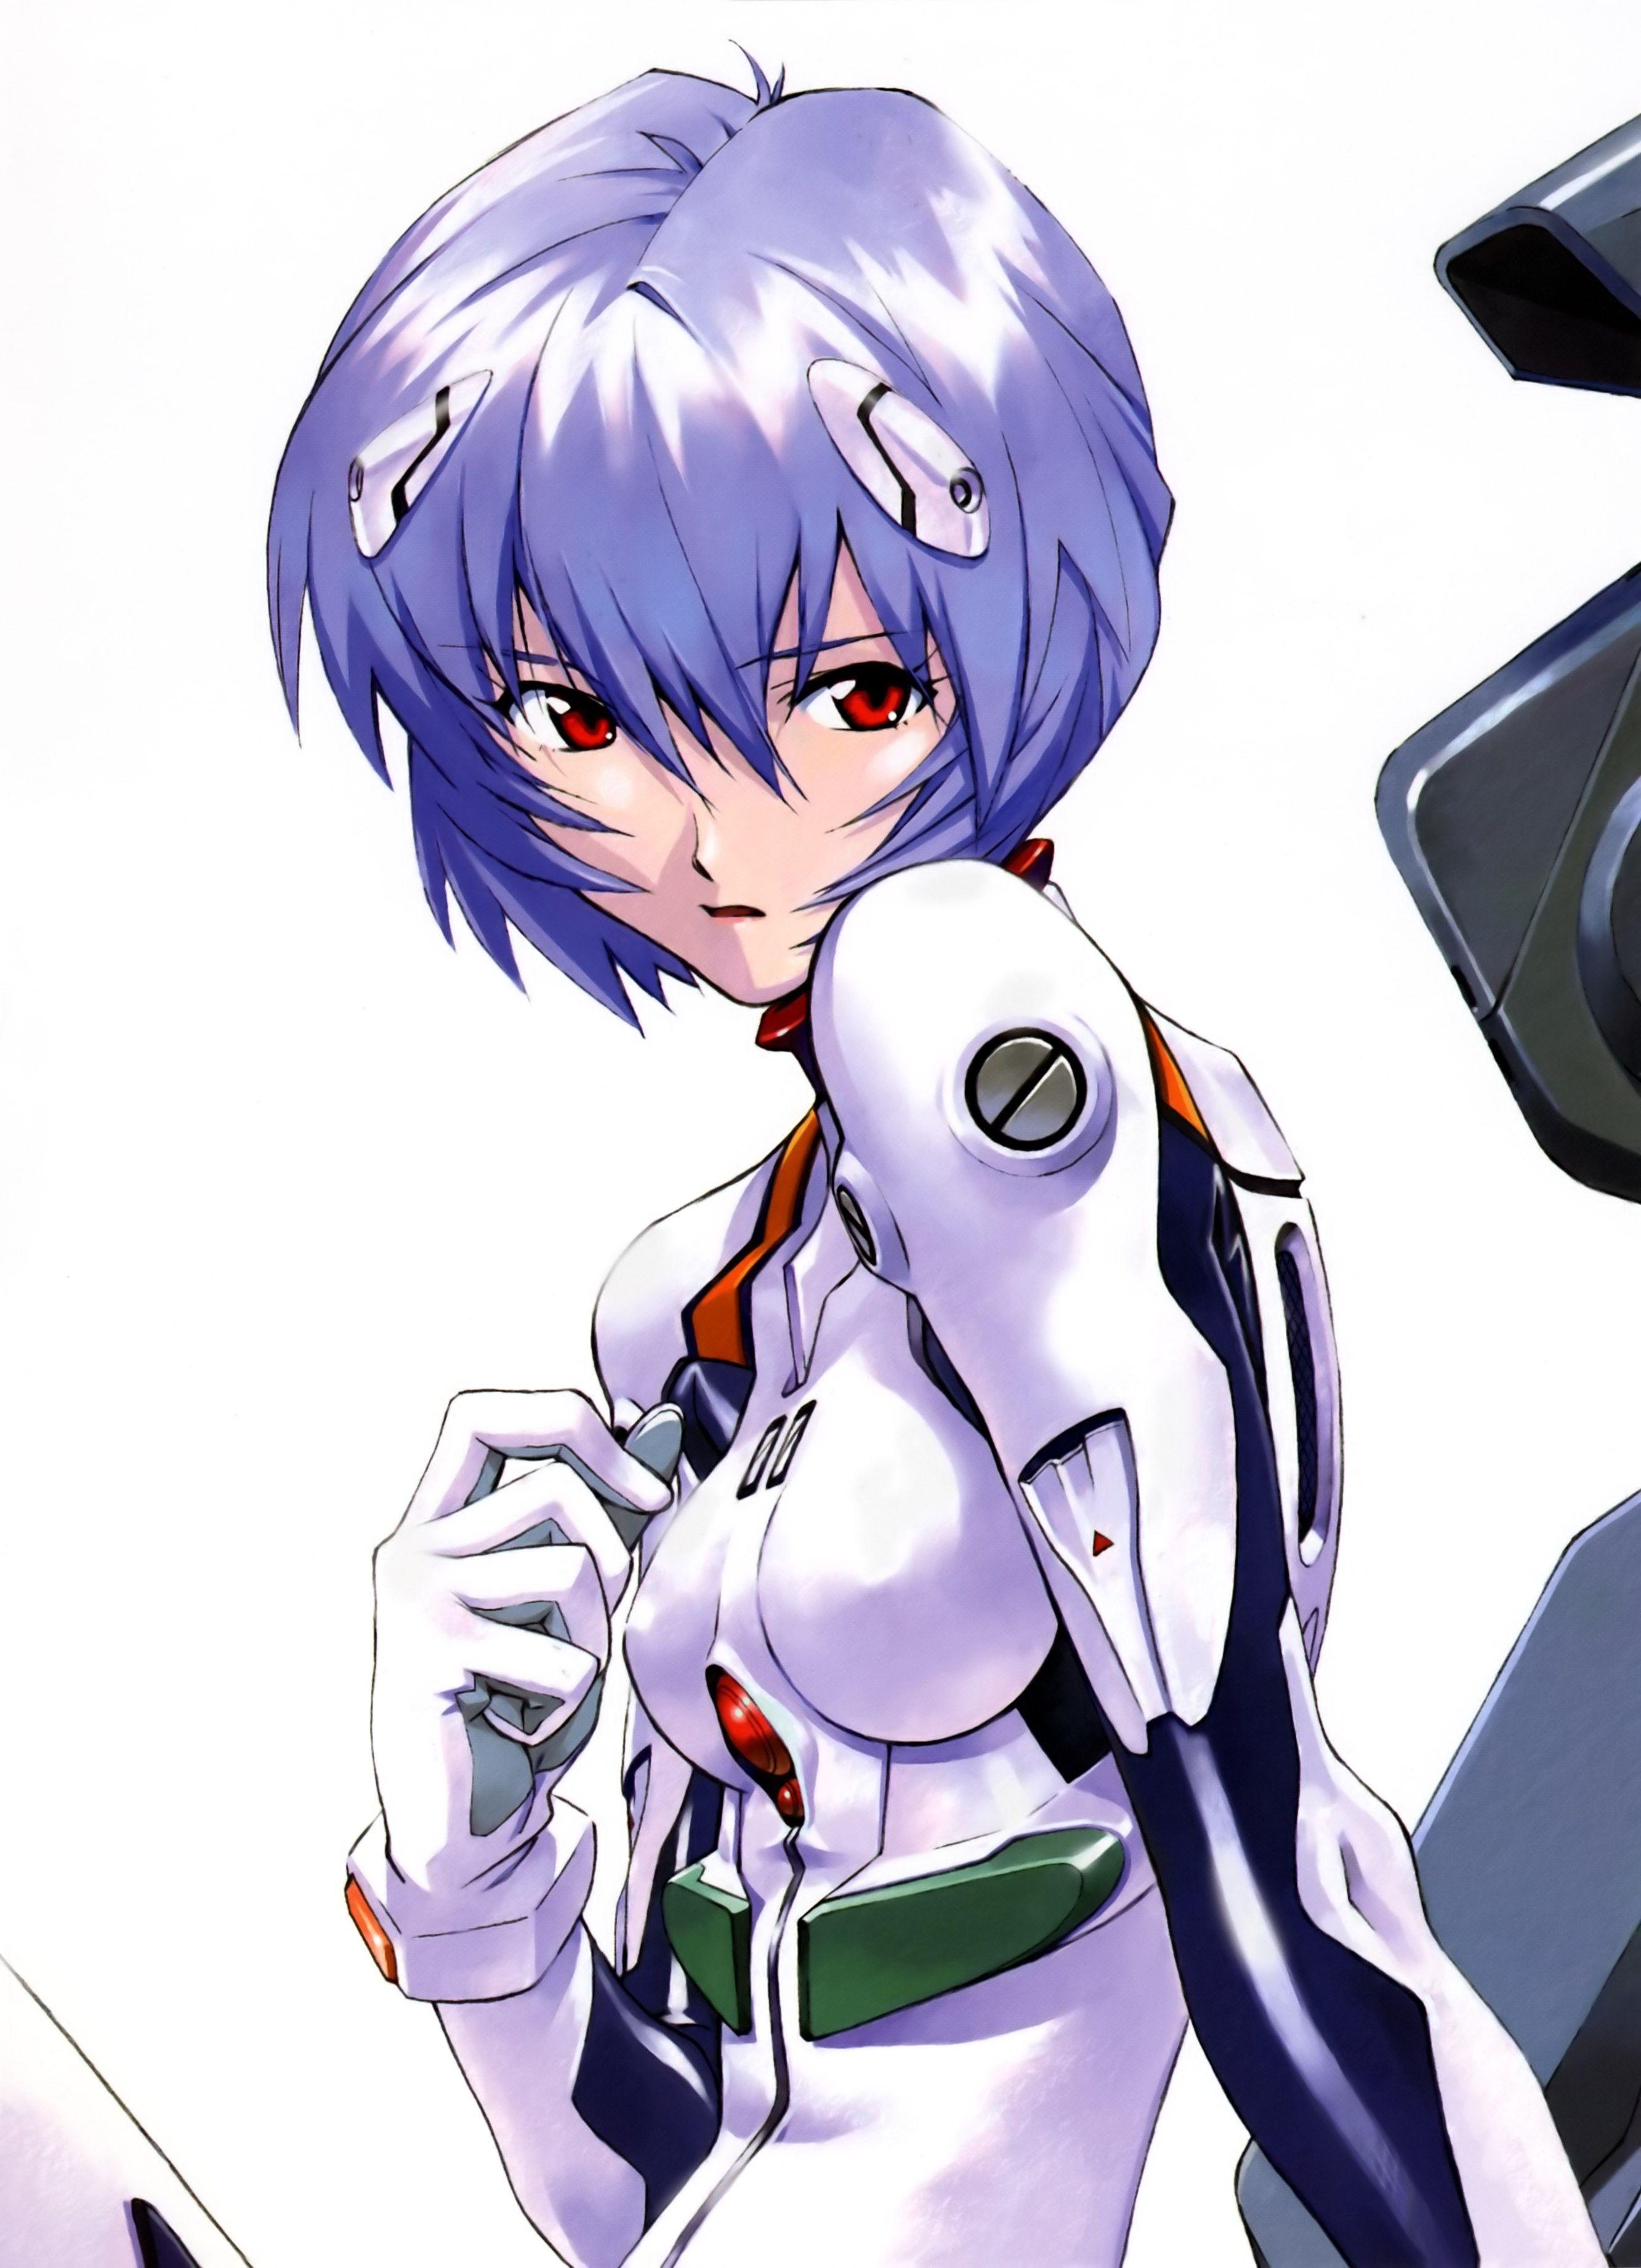 Anime 2665x3683 Neon Genesis Evangelion Ayanami Rei Simple Background Neon Evangelion Neon Genesis Evangelion Evangelion